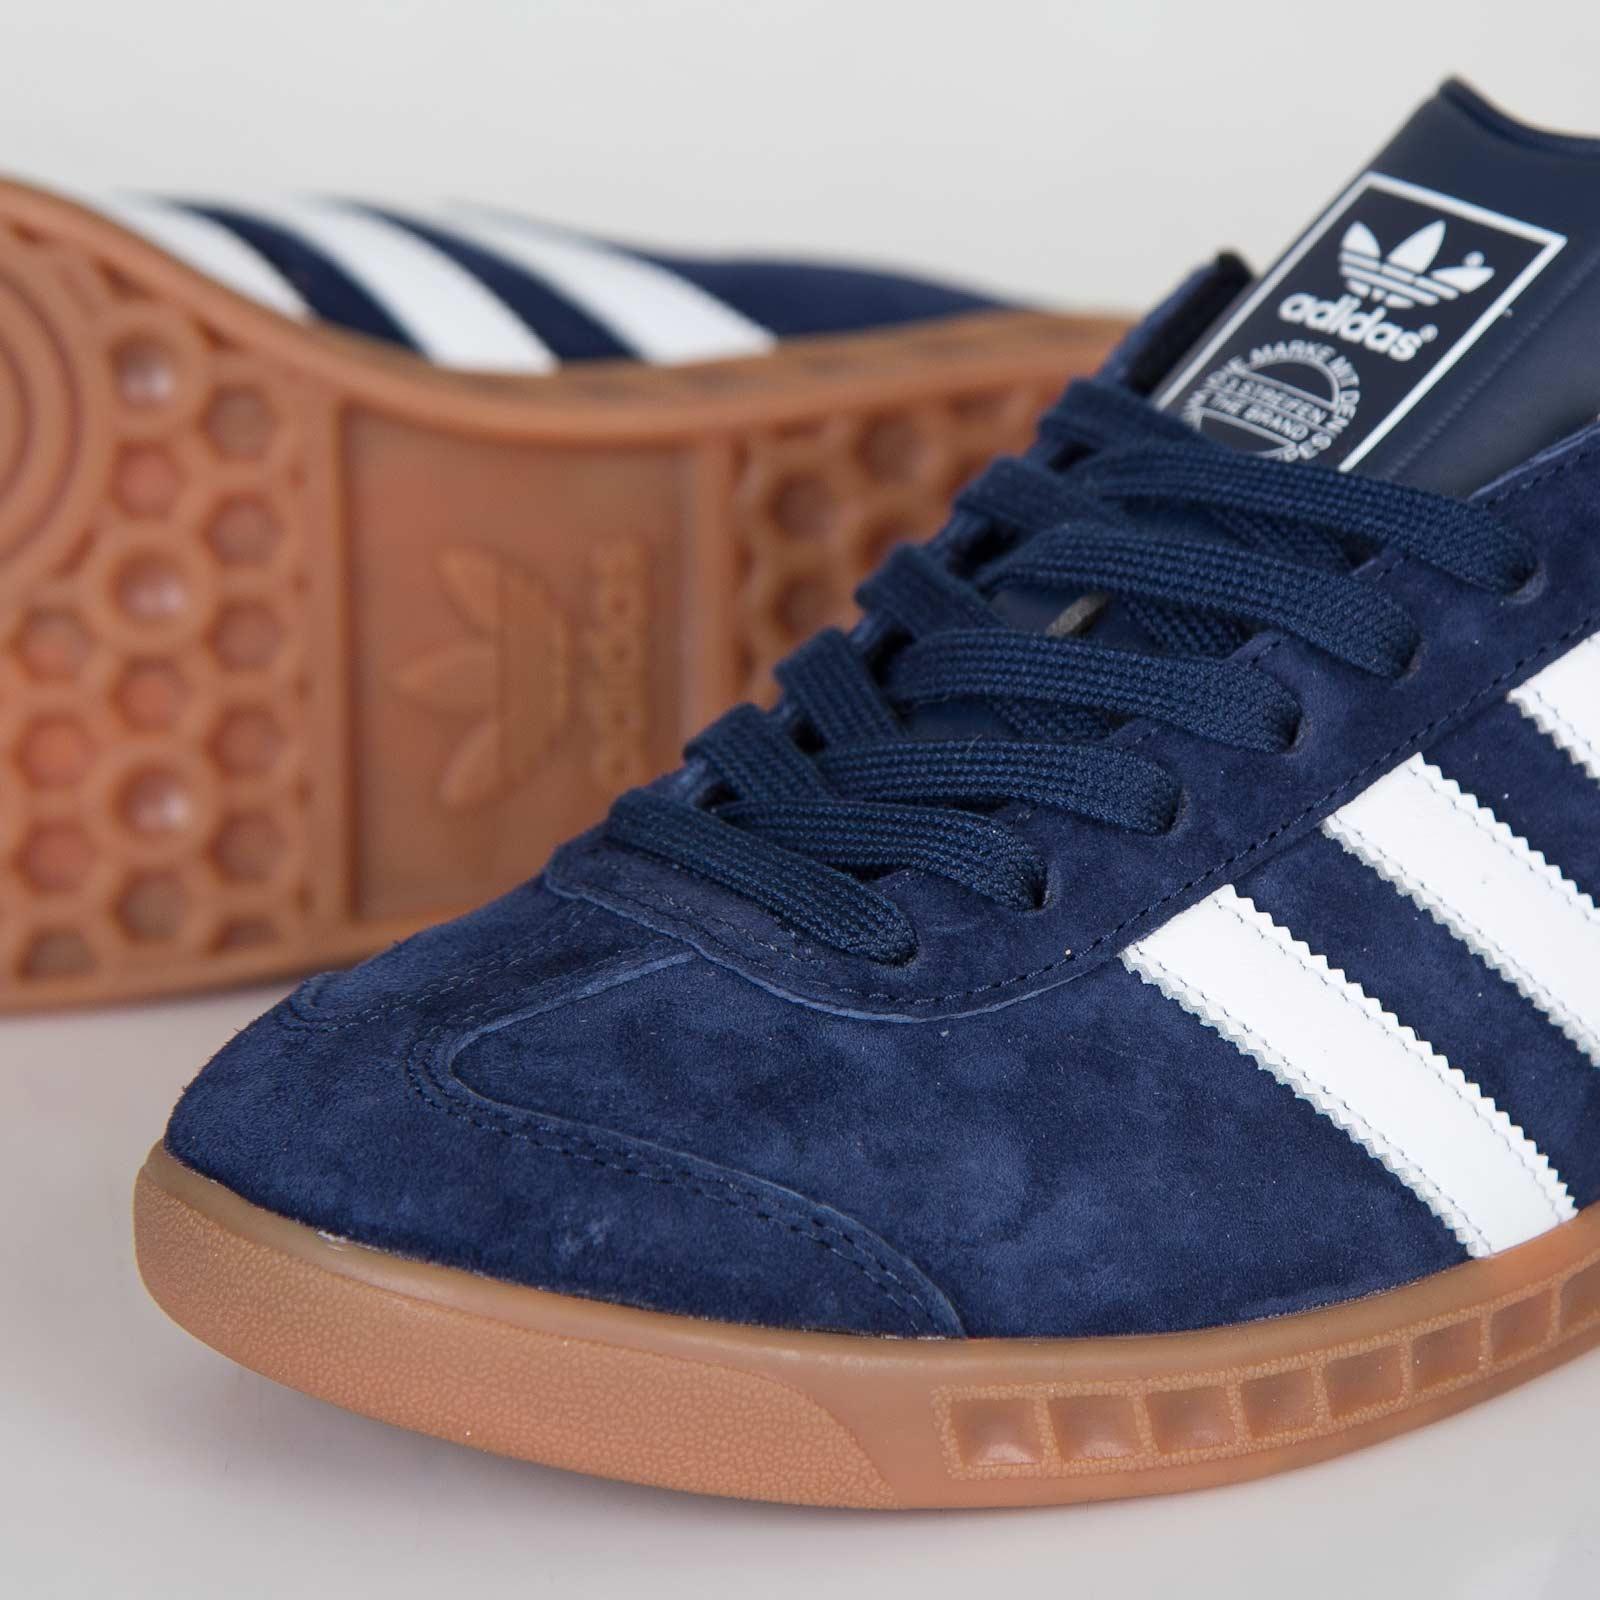 adidas Hamburg D65192 Sneakersnstuff | sneakers